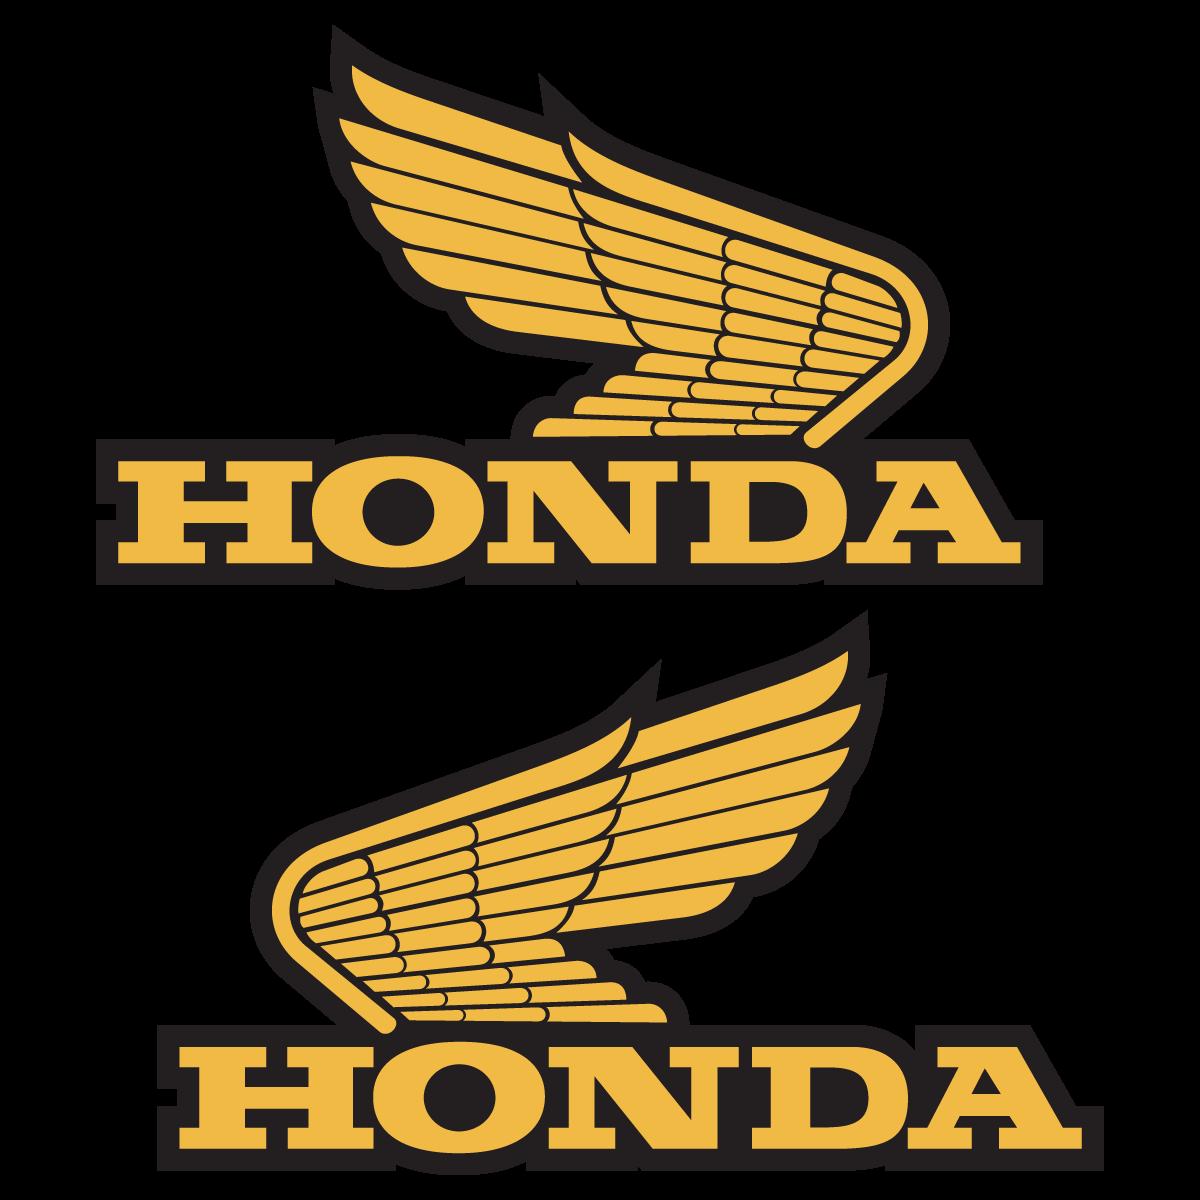 Honda Gold Wing Logo Decal Sticker Vector Stiker Desain Desain Stiker